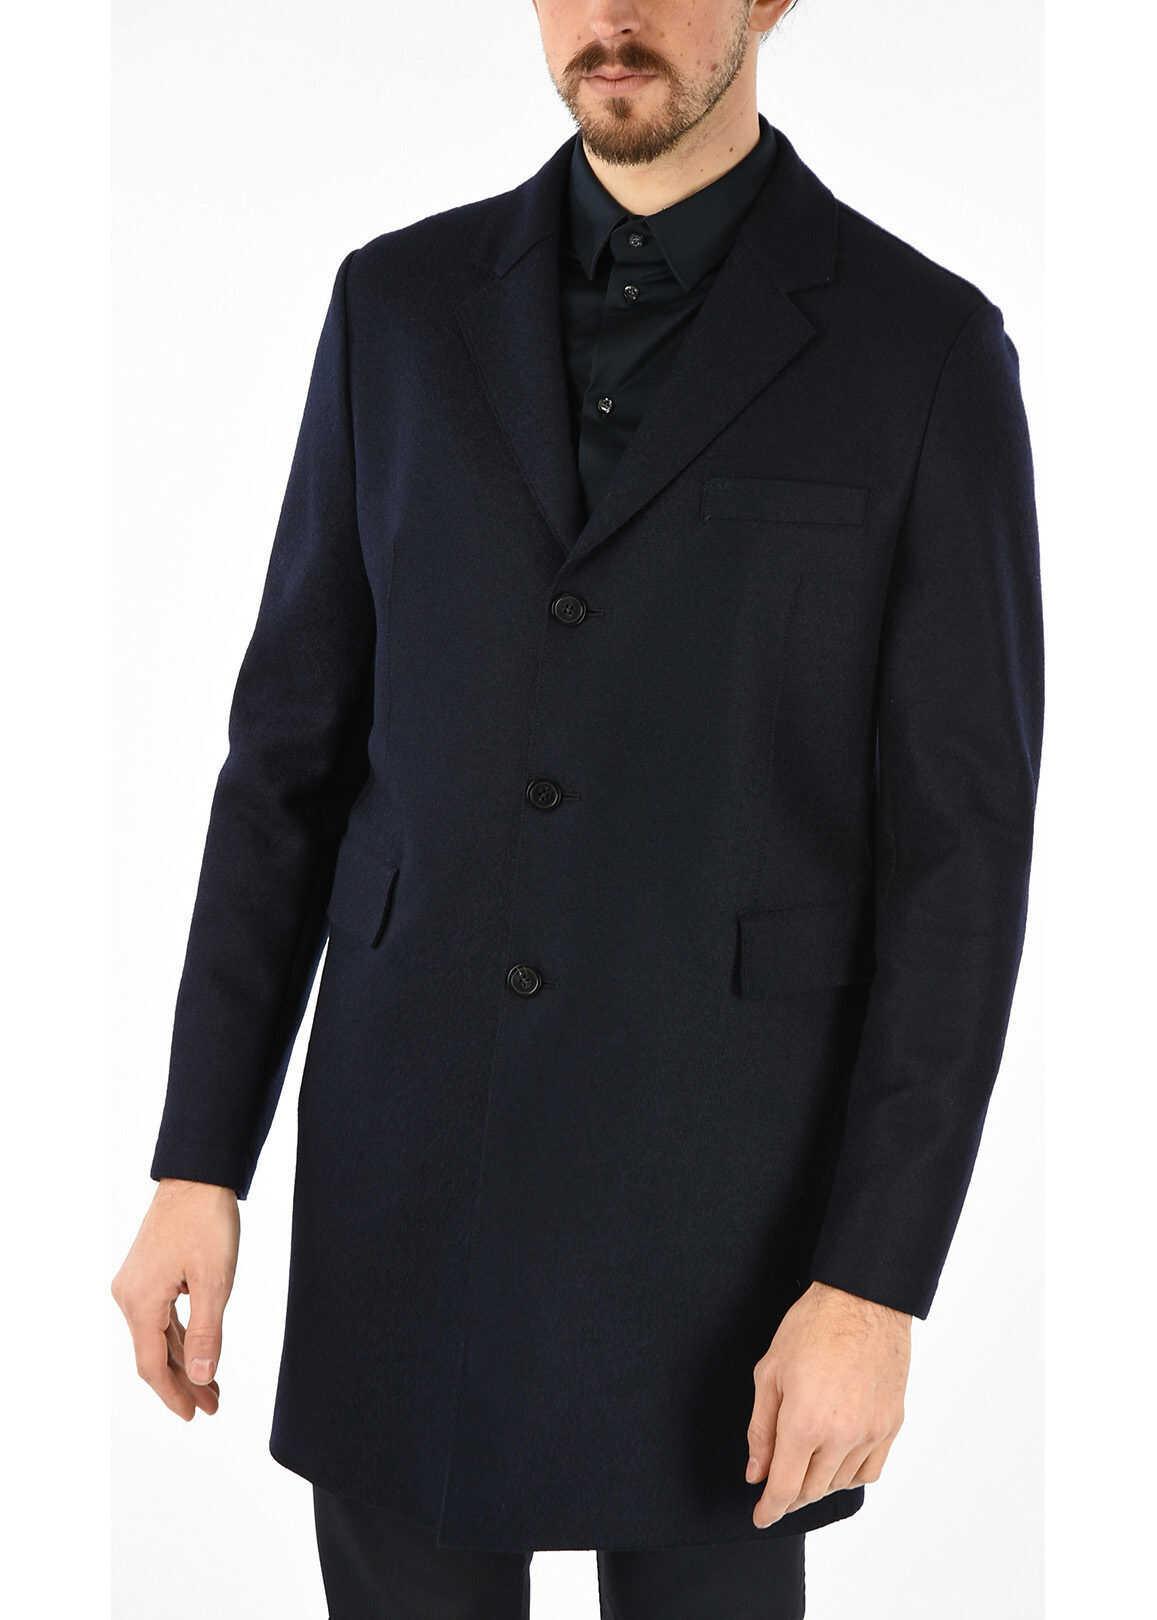 Armani EMPORIO Wool Single Breasted Coat BLUE